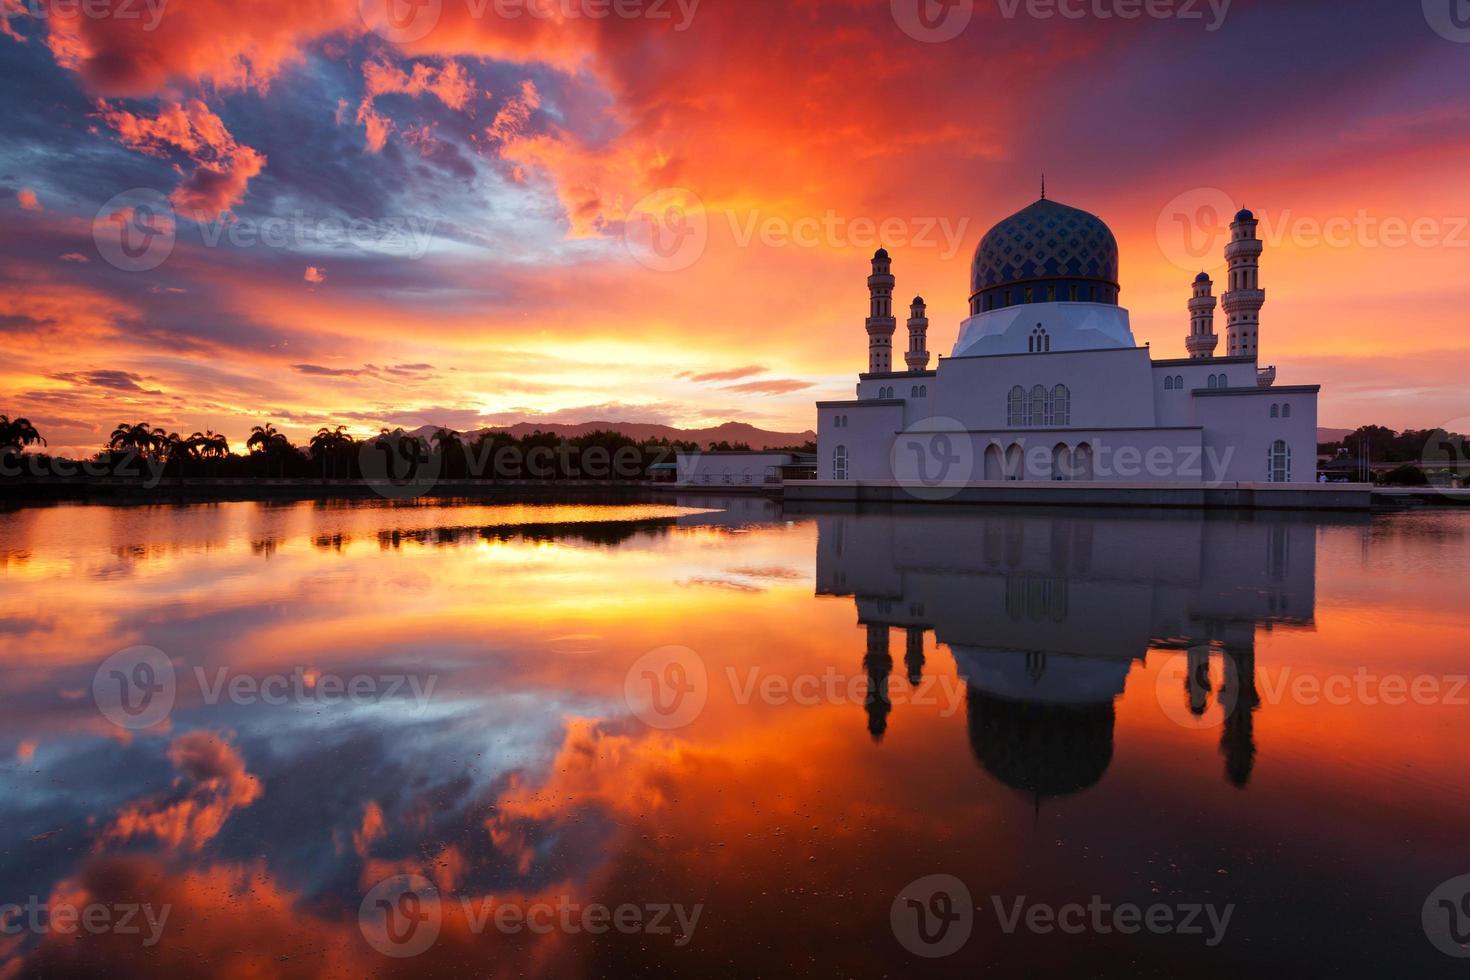 bella kota kinabalu moschea della città al sorgere del sole a Sabah, Malesia foto